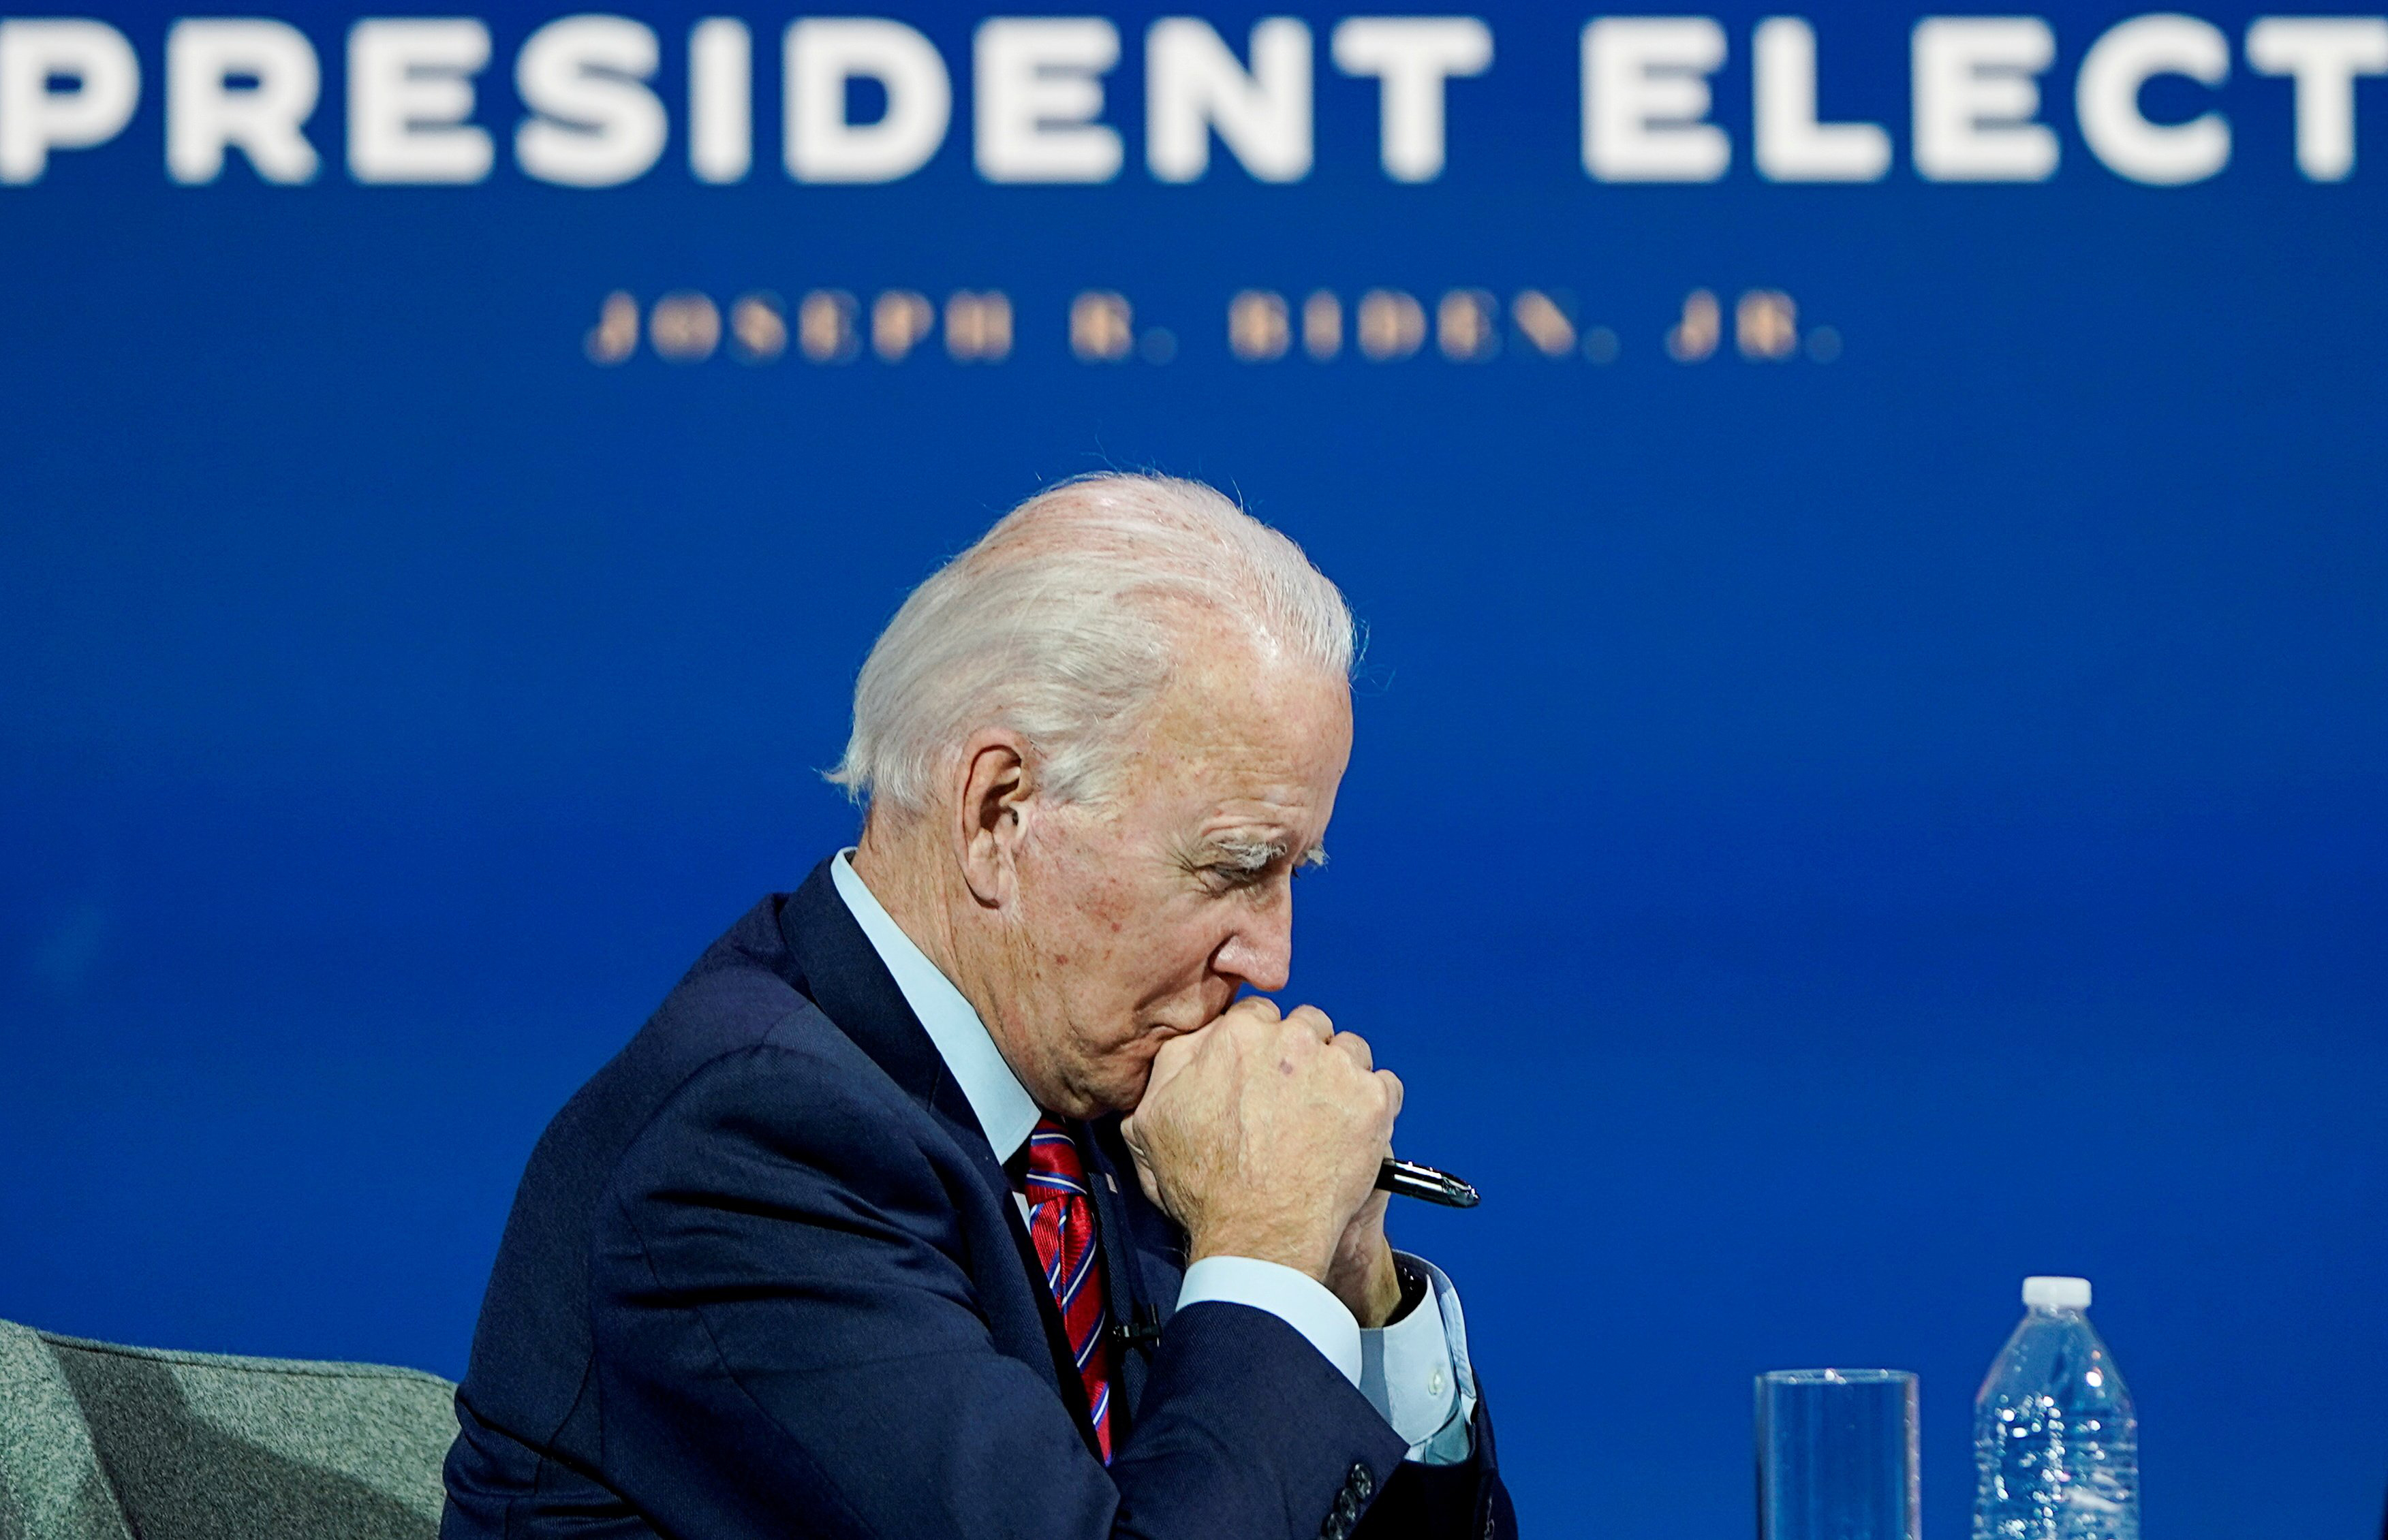 Biden transition team criticizes cooperation from Pentagon